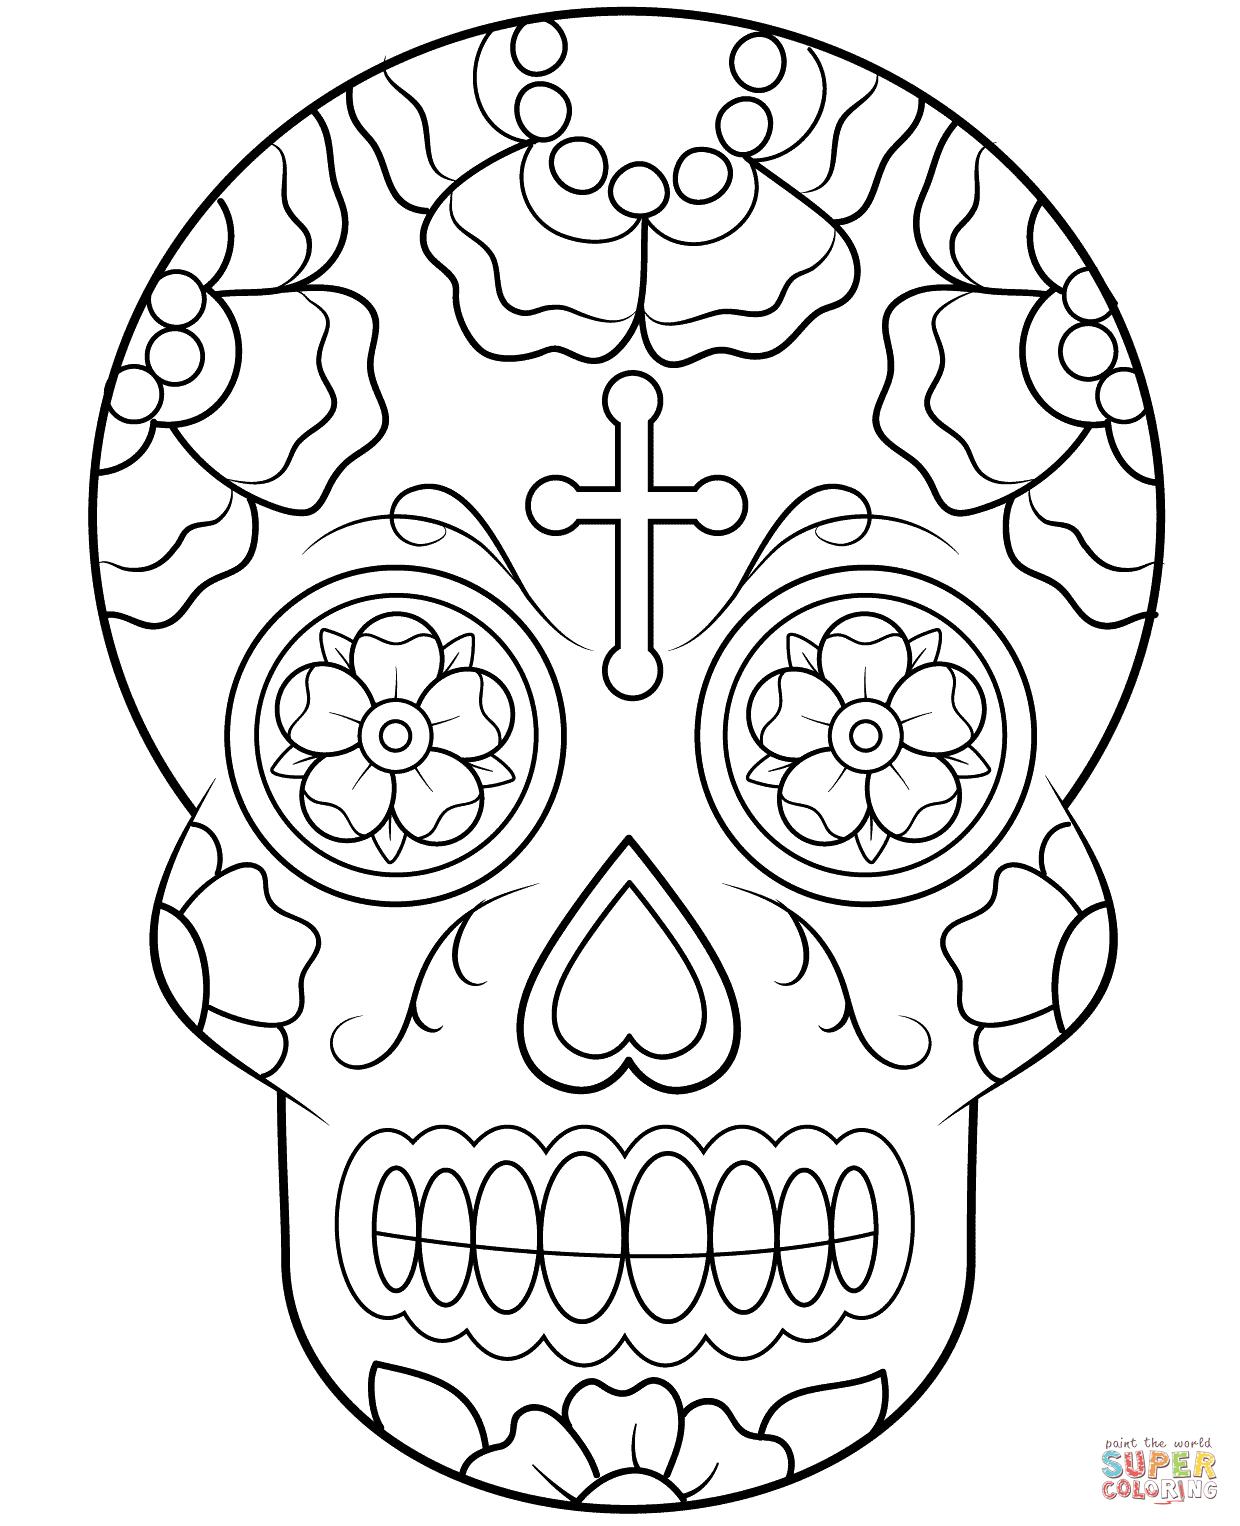 Beste Skeletons Coloring Pages Galerie - Malvorlagen-Ideen ...